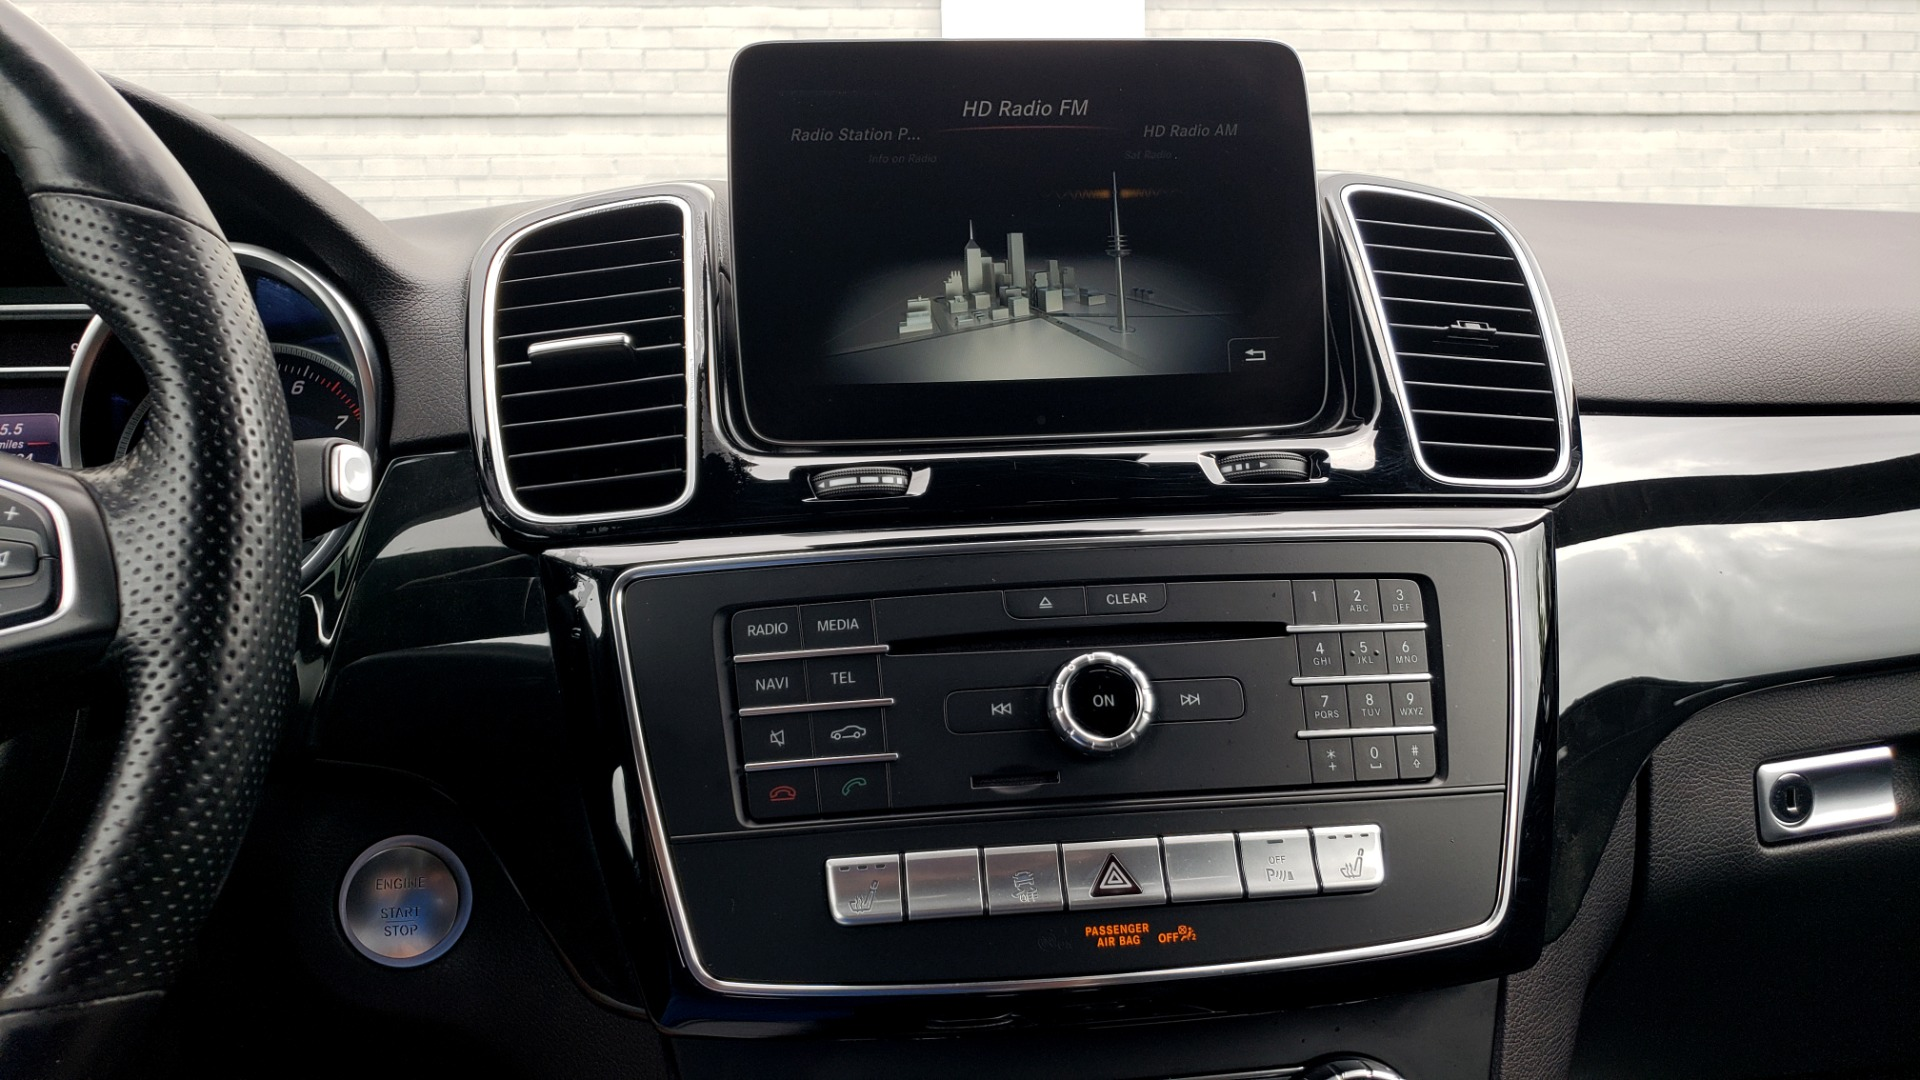 Used 2018 Mercedes-Benz GLE 350 4MATIC / PREM PKG / NAV / PARK ASST / K/H SND / HITCH / REARVIEW for sale $40,801 at Formula Imports in Charlotte NC 28227 46